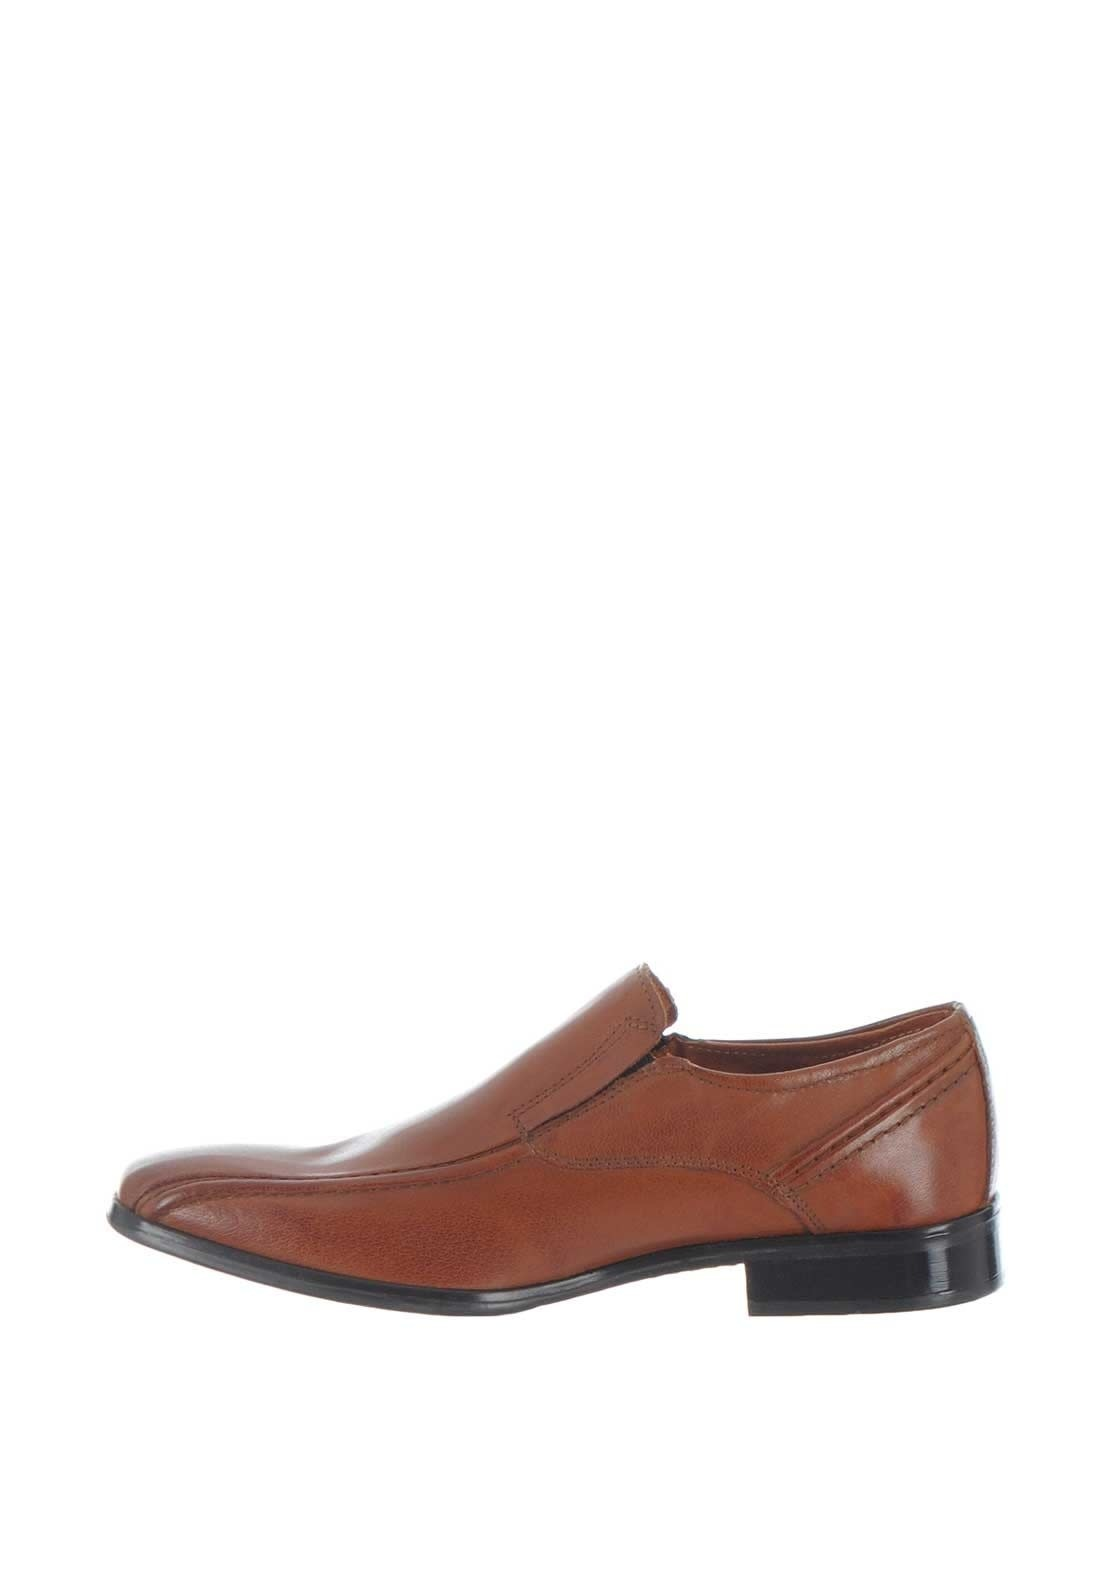 Dubarry Deegan slip on shoe